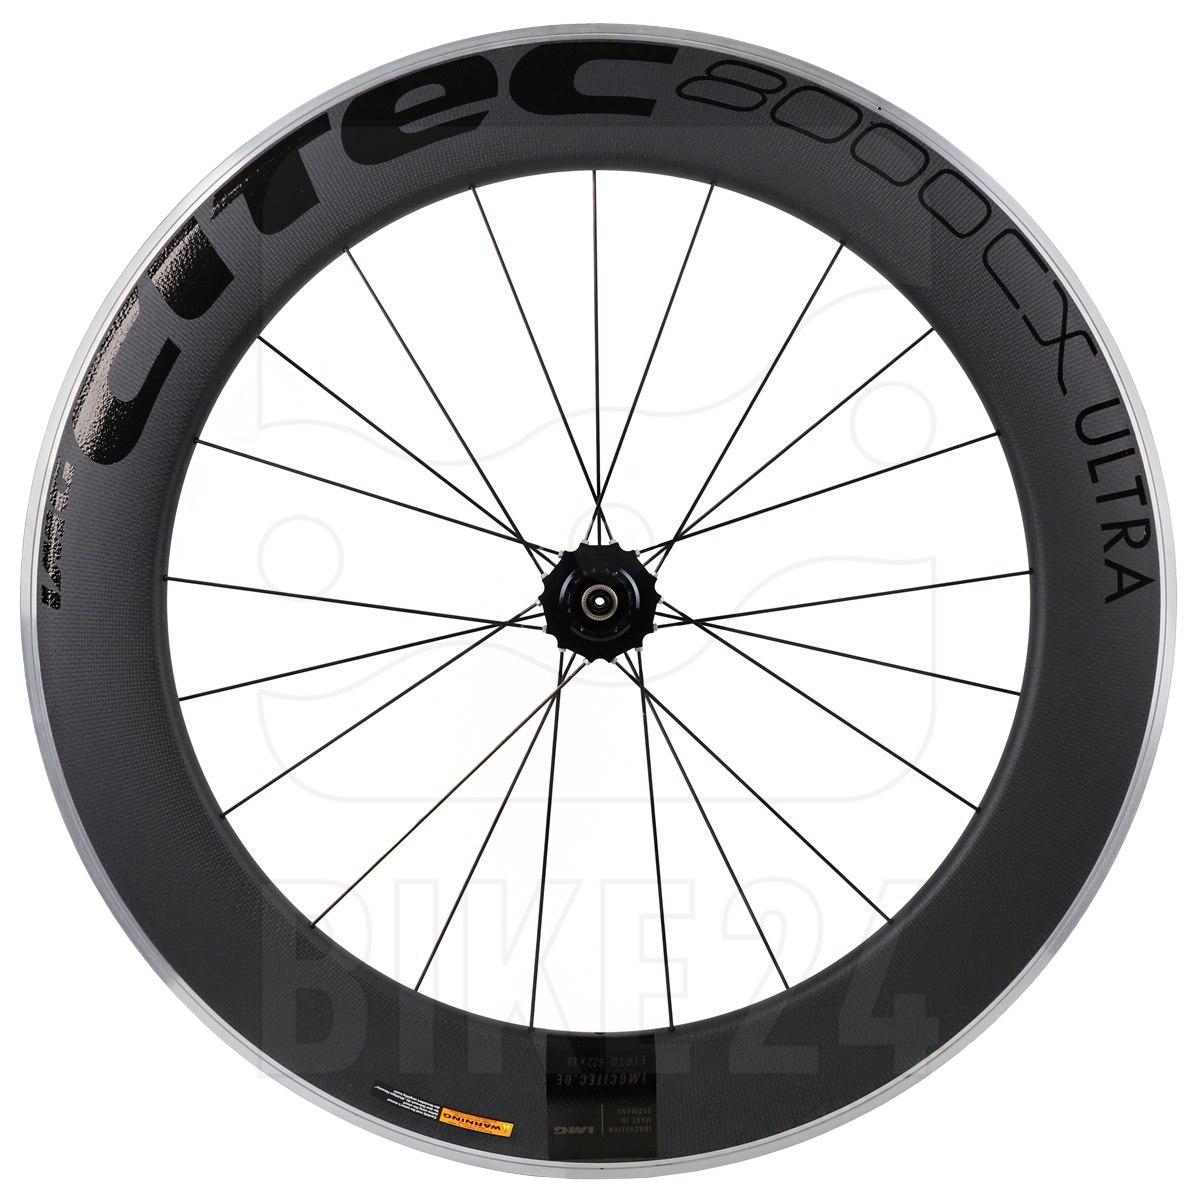 CITEC 8000 CX / 80 Ultra Carbon 28 Inch Rear Wheel - Clincher - 10x130mm QR - black